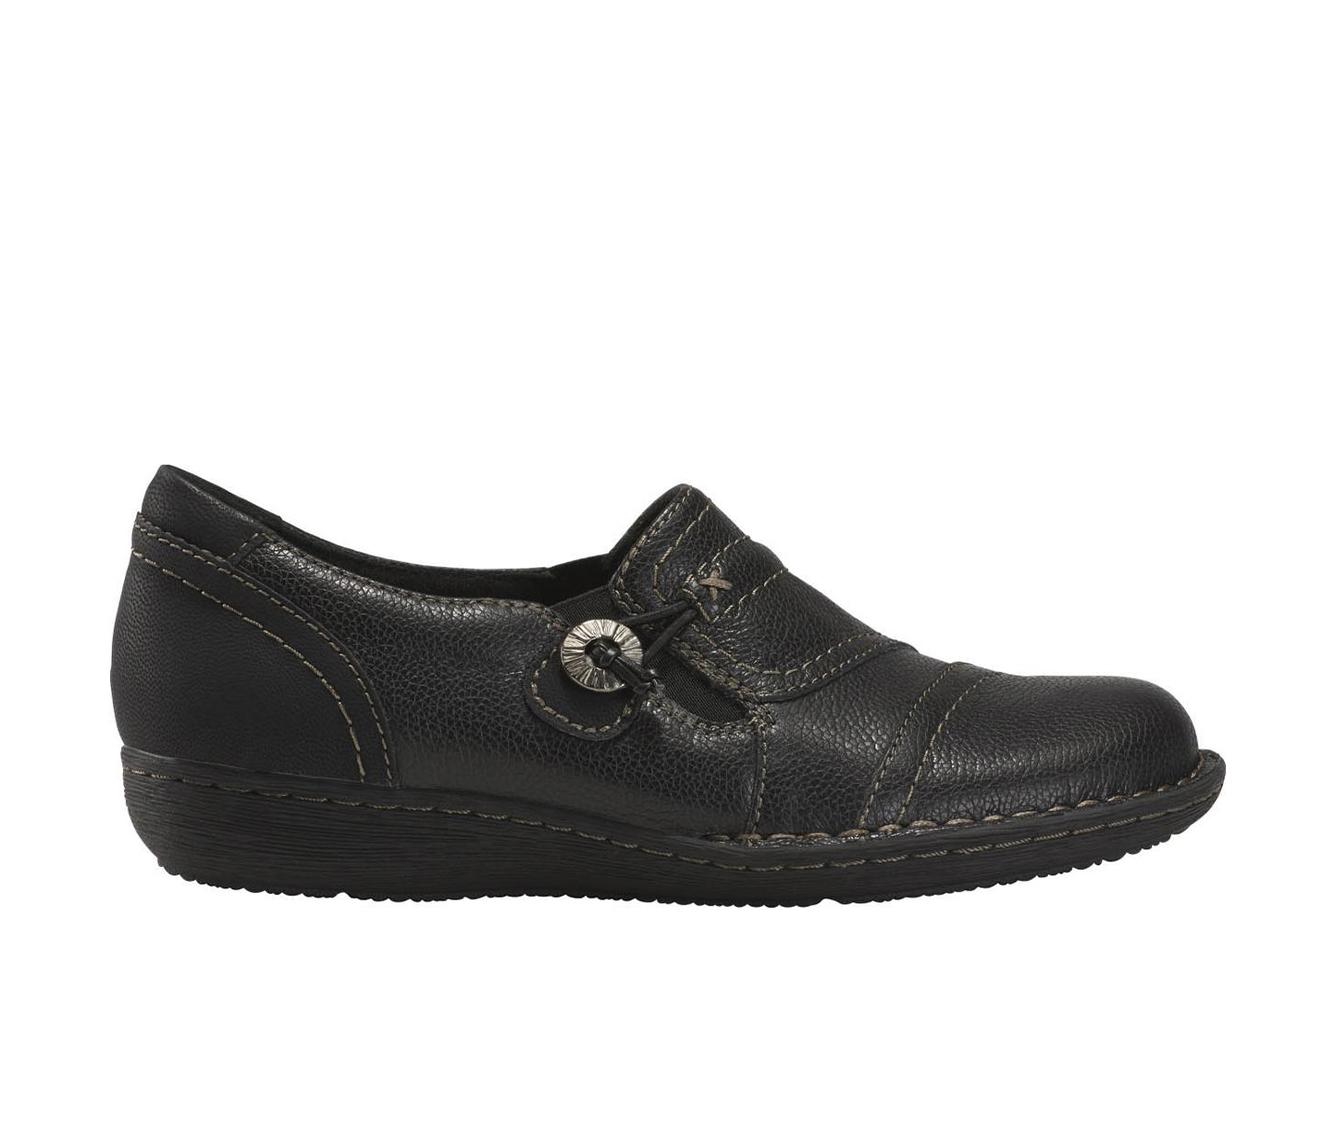 Earth Origins Tamara Tami Women's Shoe (Black Leather)